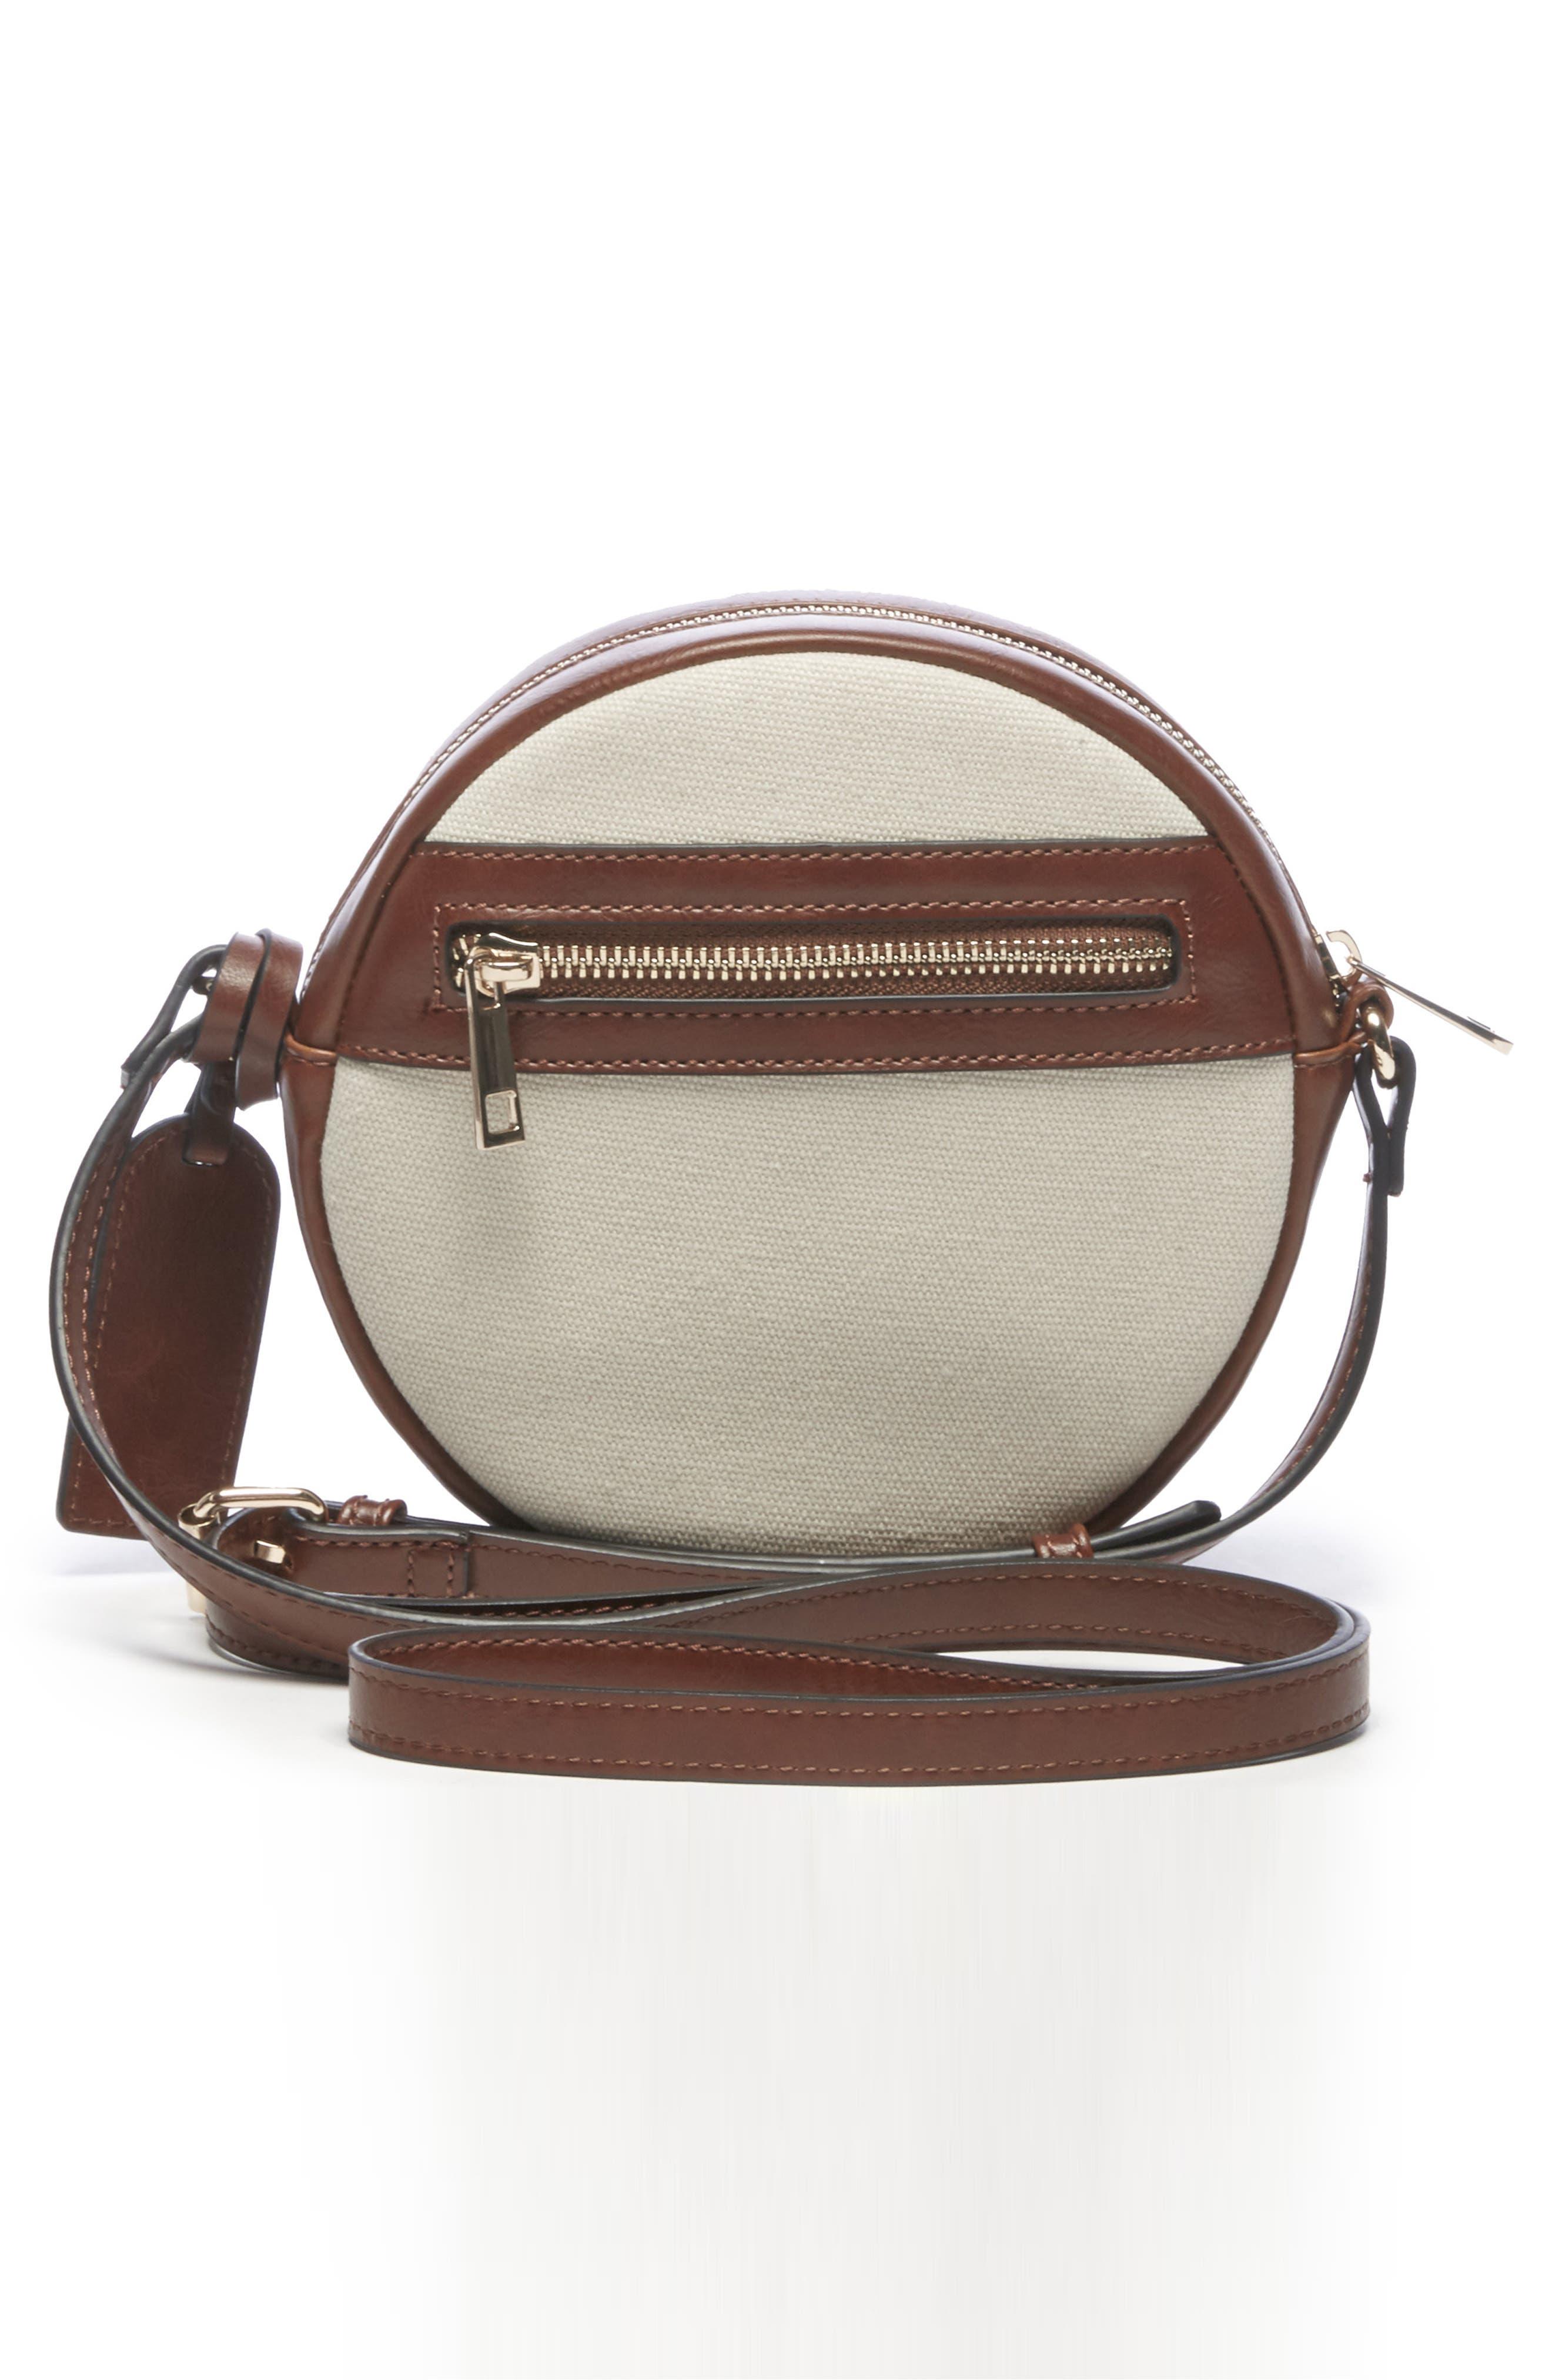 Aira Studded Crossbody Bag,                             Alternate thumbnail 2, color,                             NATURAL